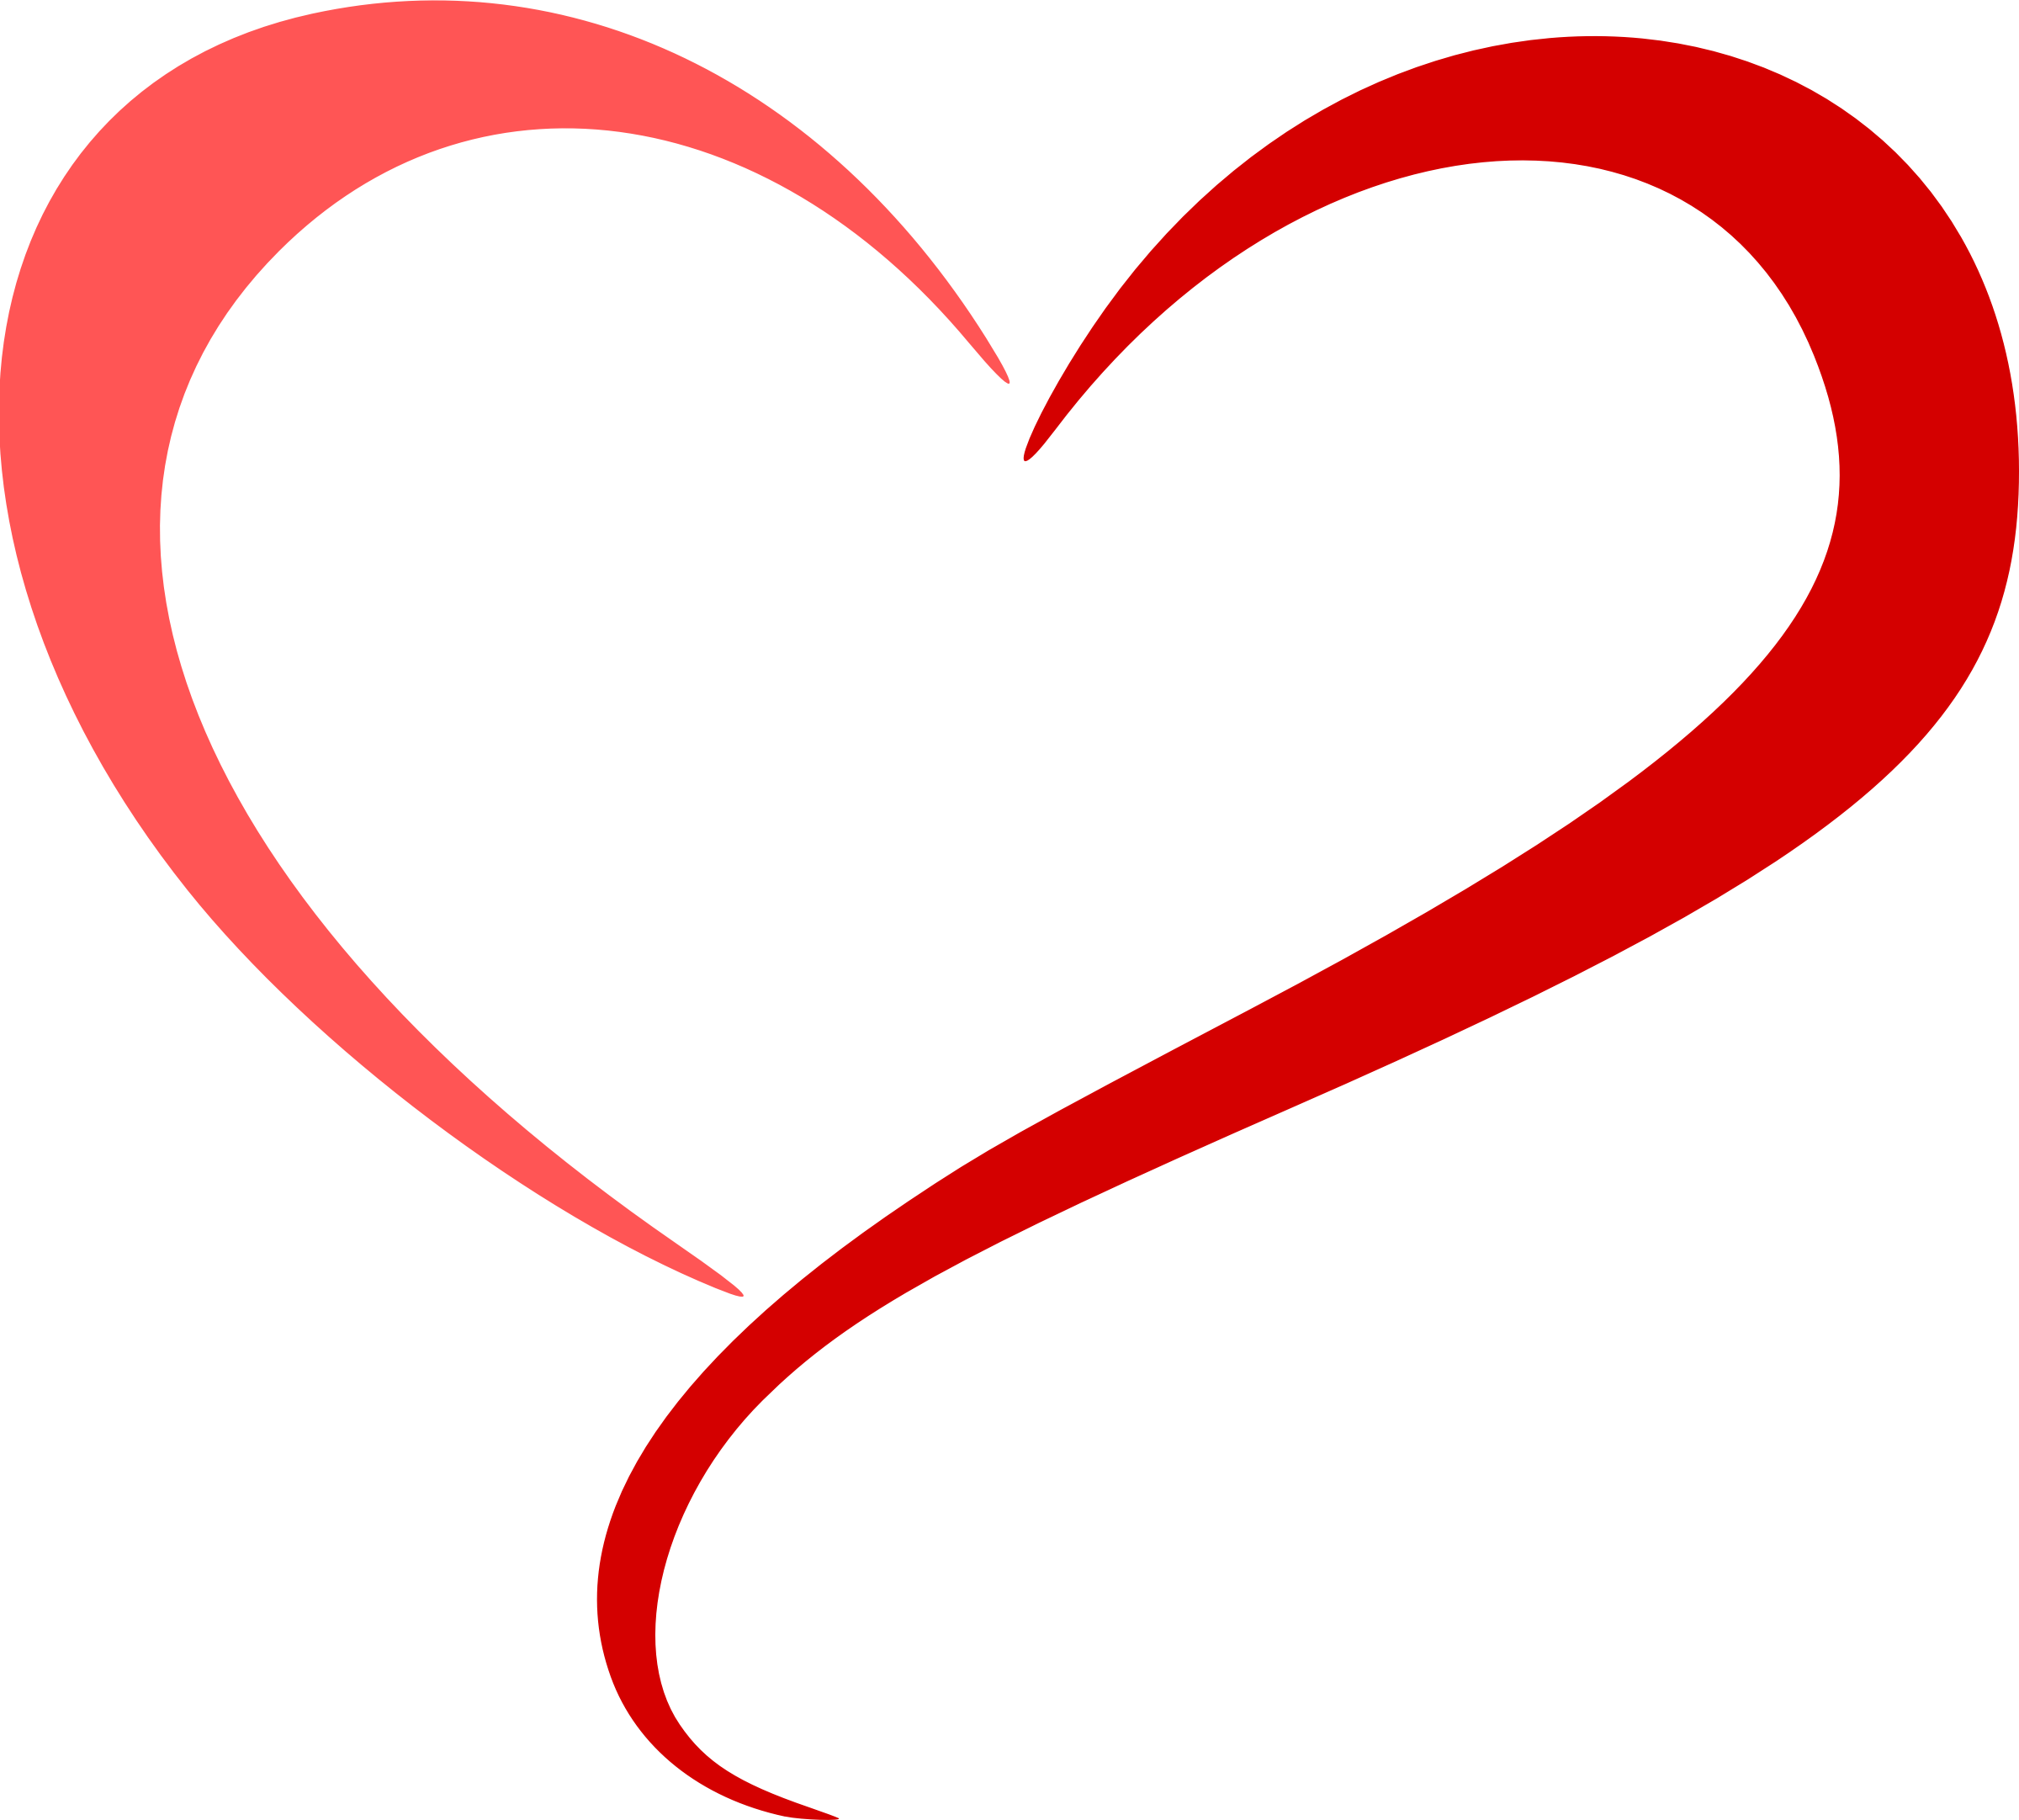 Abstract heart clipart jpg stock Clipart - Abstract heart 5 (colour) jpg stock